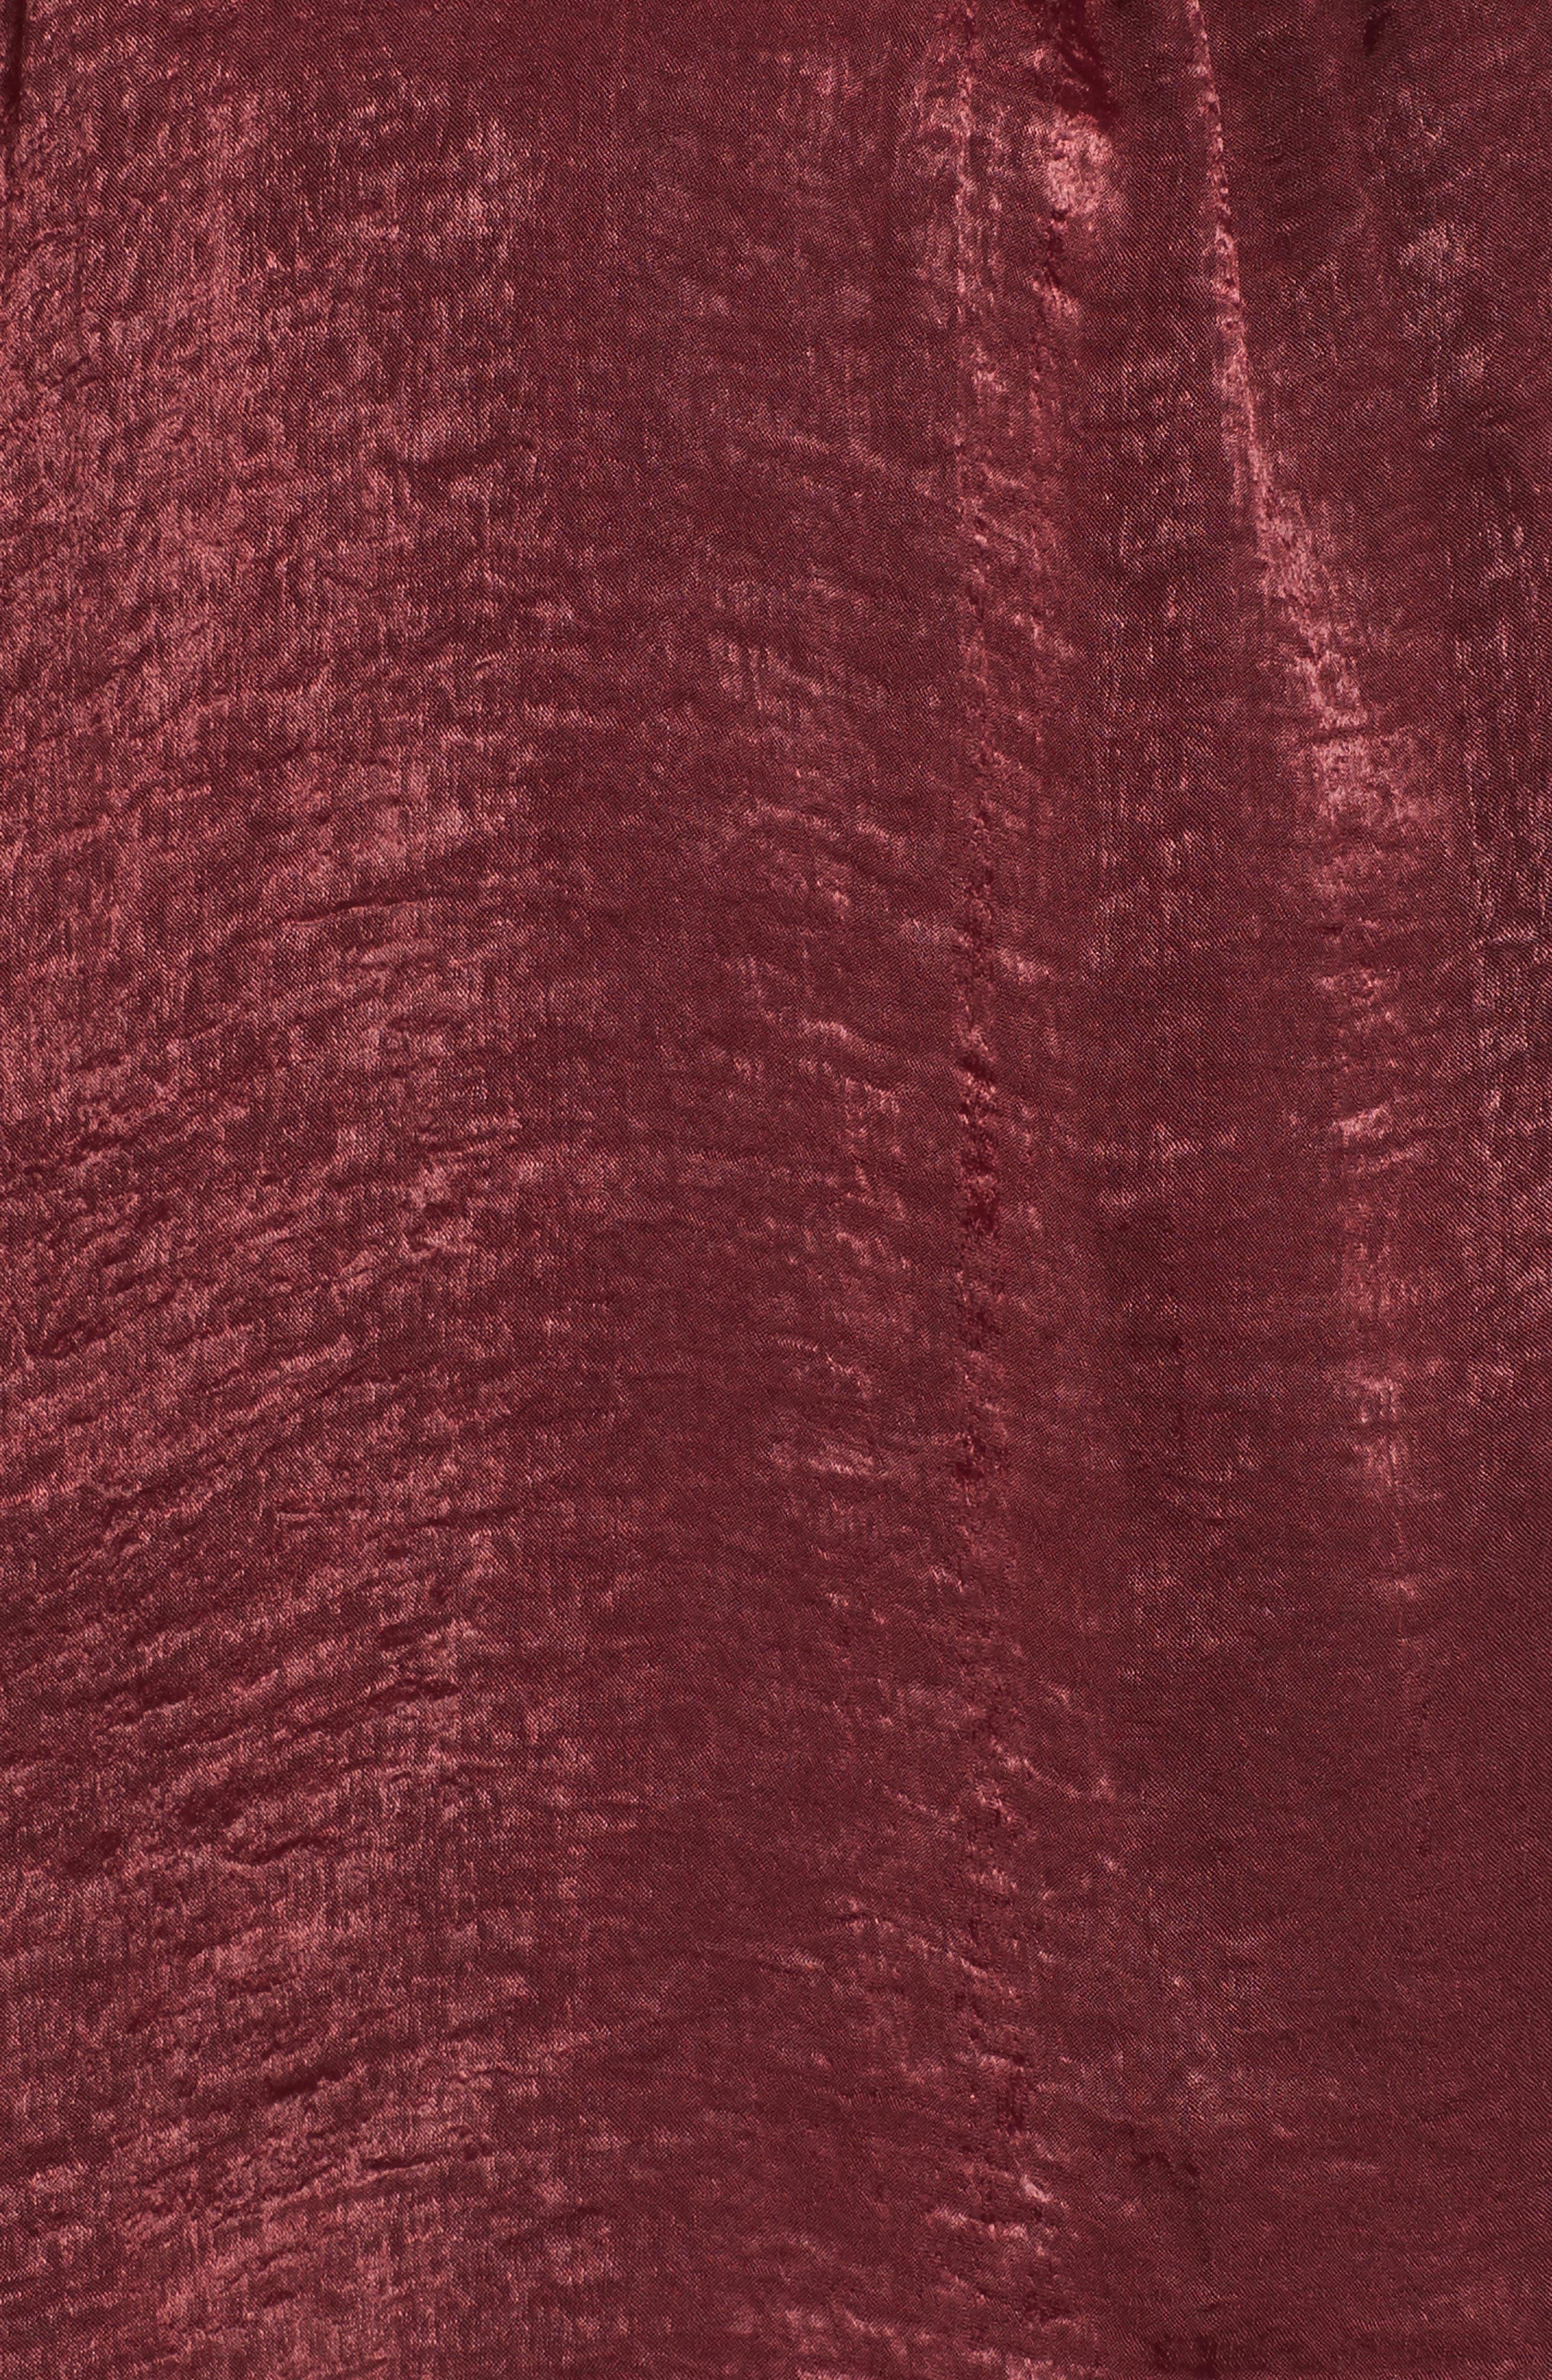 Bell Sleeve Hammered Satin Blouse,                             Alternate thumbnail 20, color,